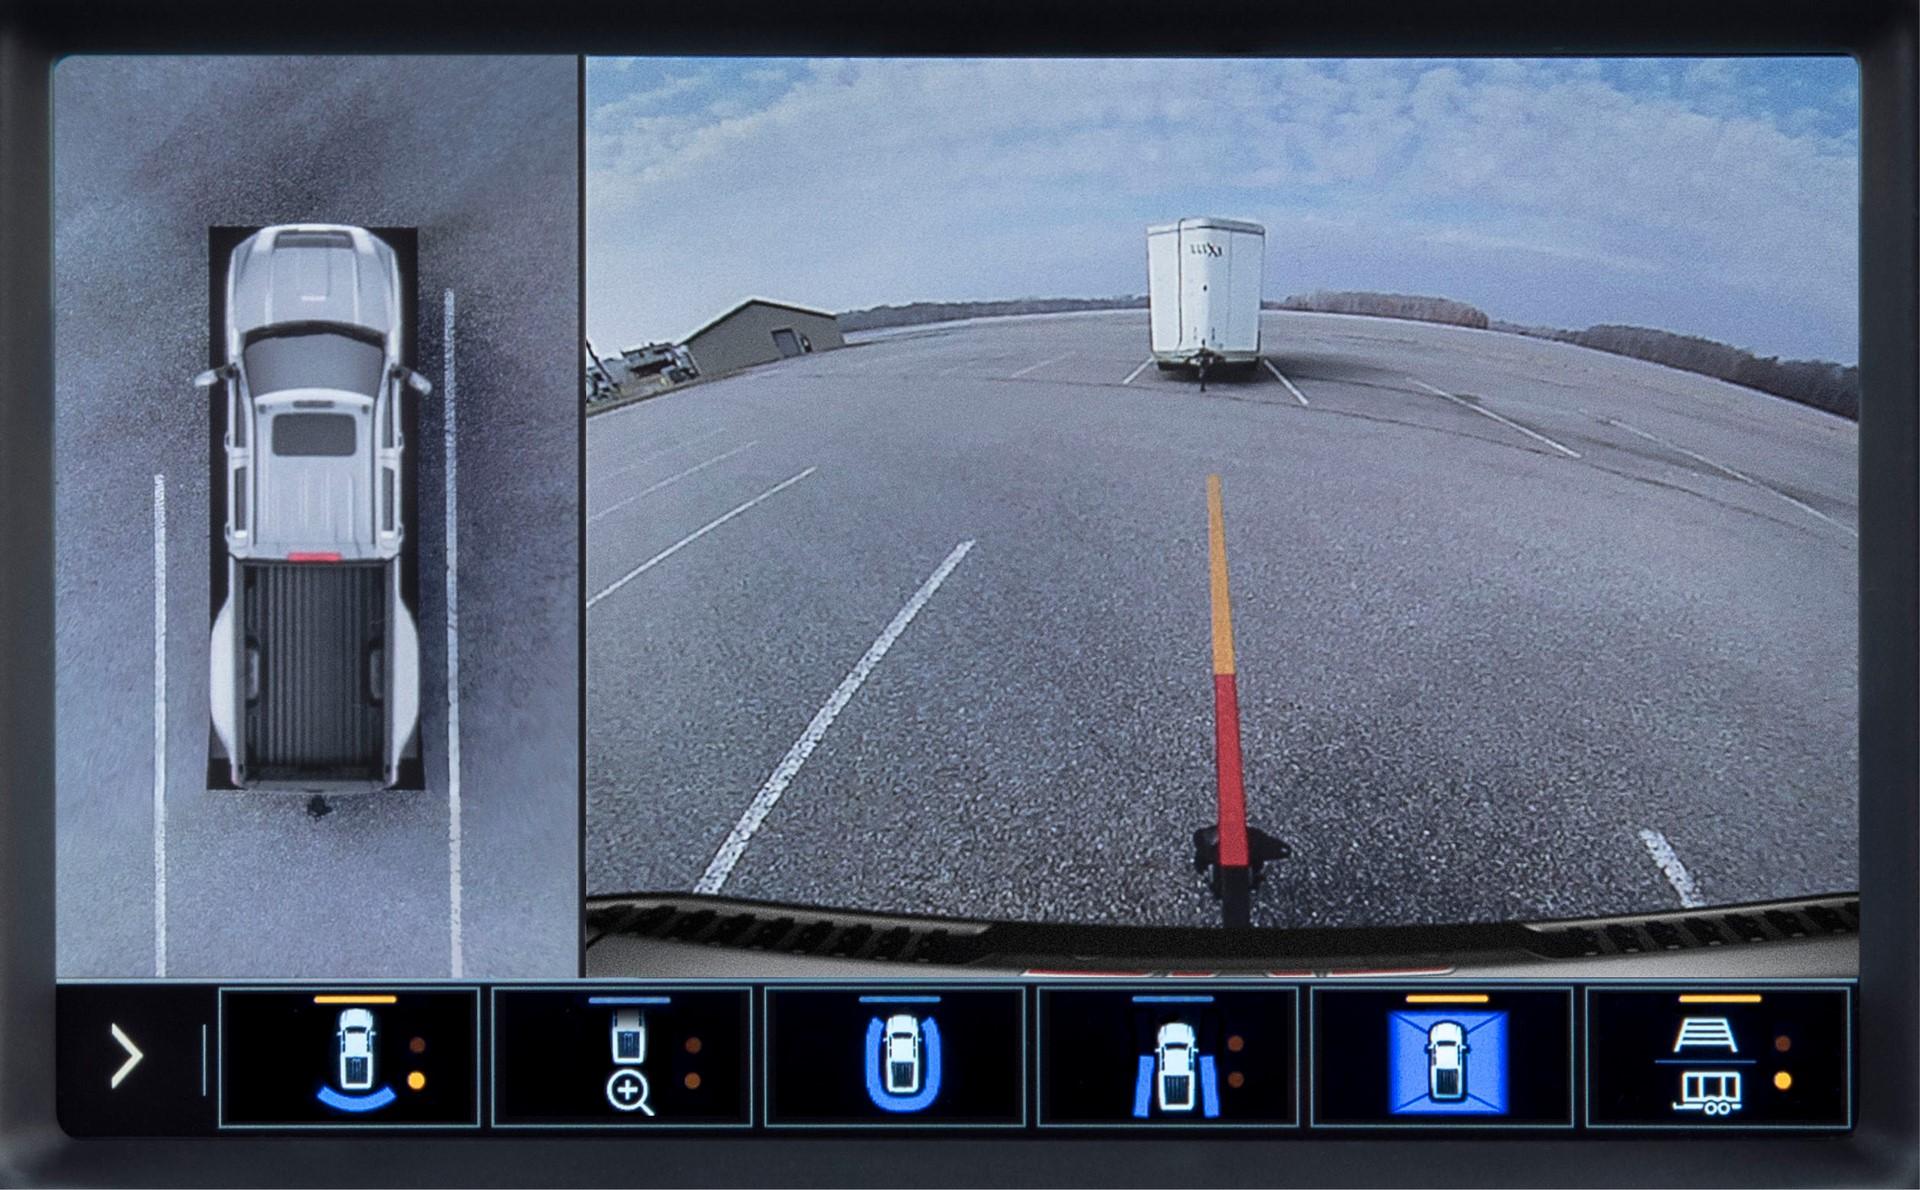 2020 GMC Sierra HD Rear Surround Camera View